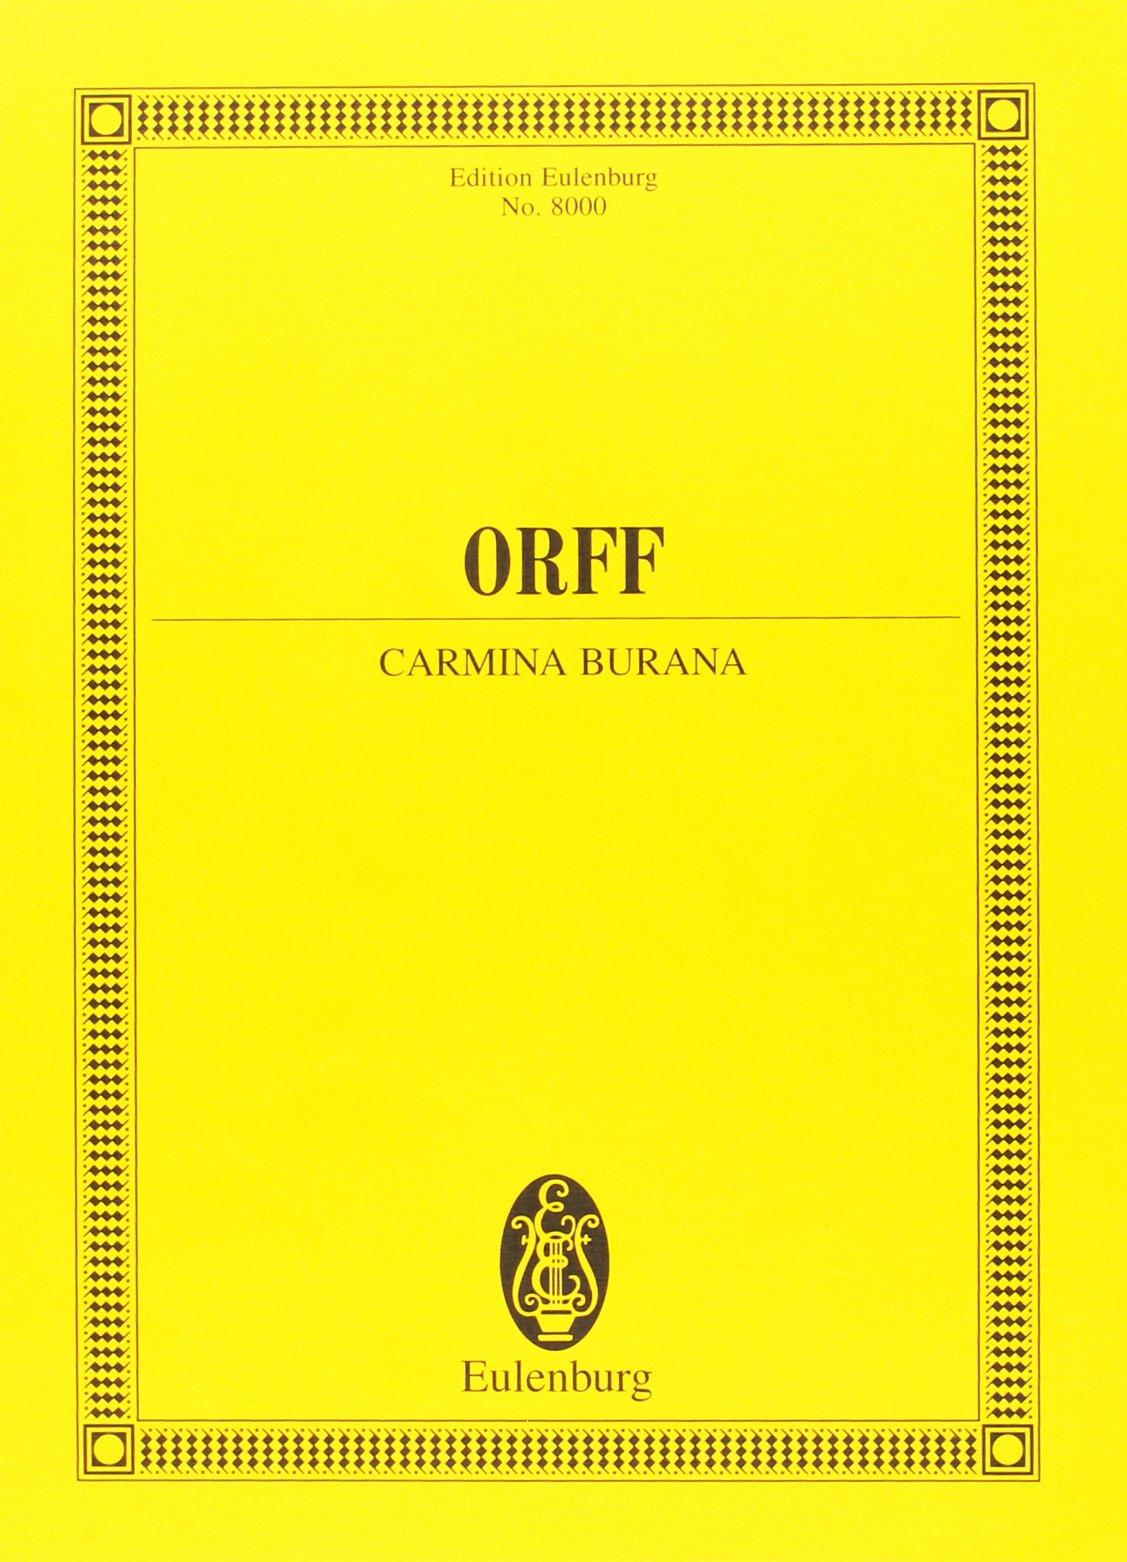 Carmina Burana - Conducteur (Allemand) Partition – 1 janvier 2009 Orff C Eulenburg B0029U2RFA Musique